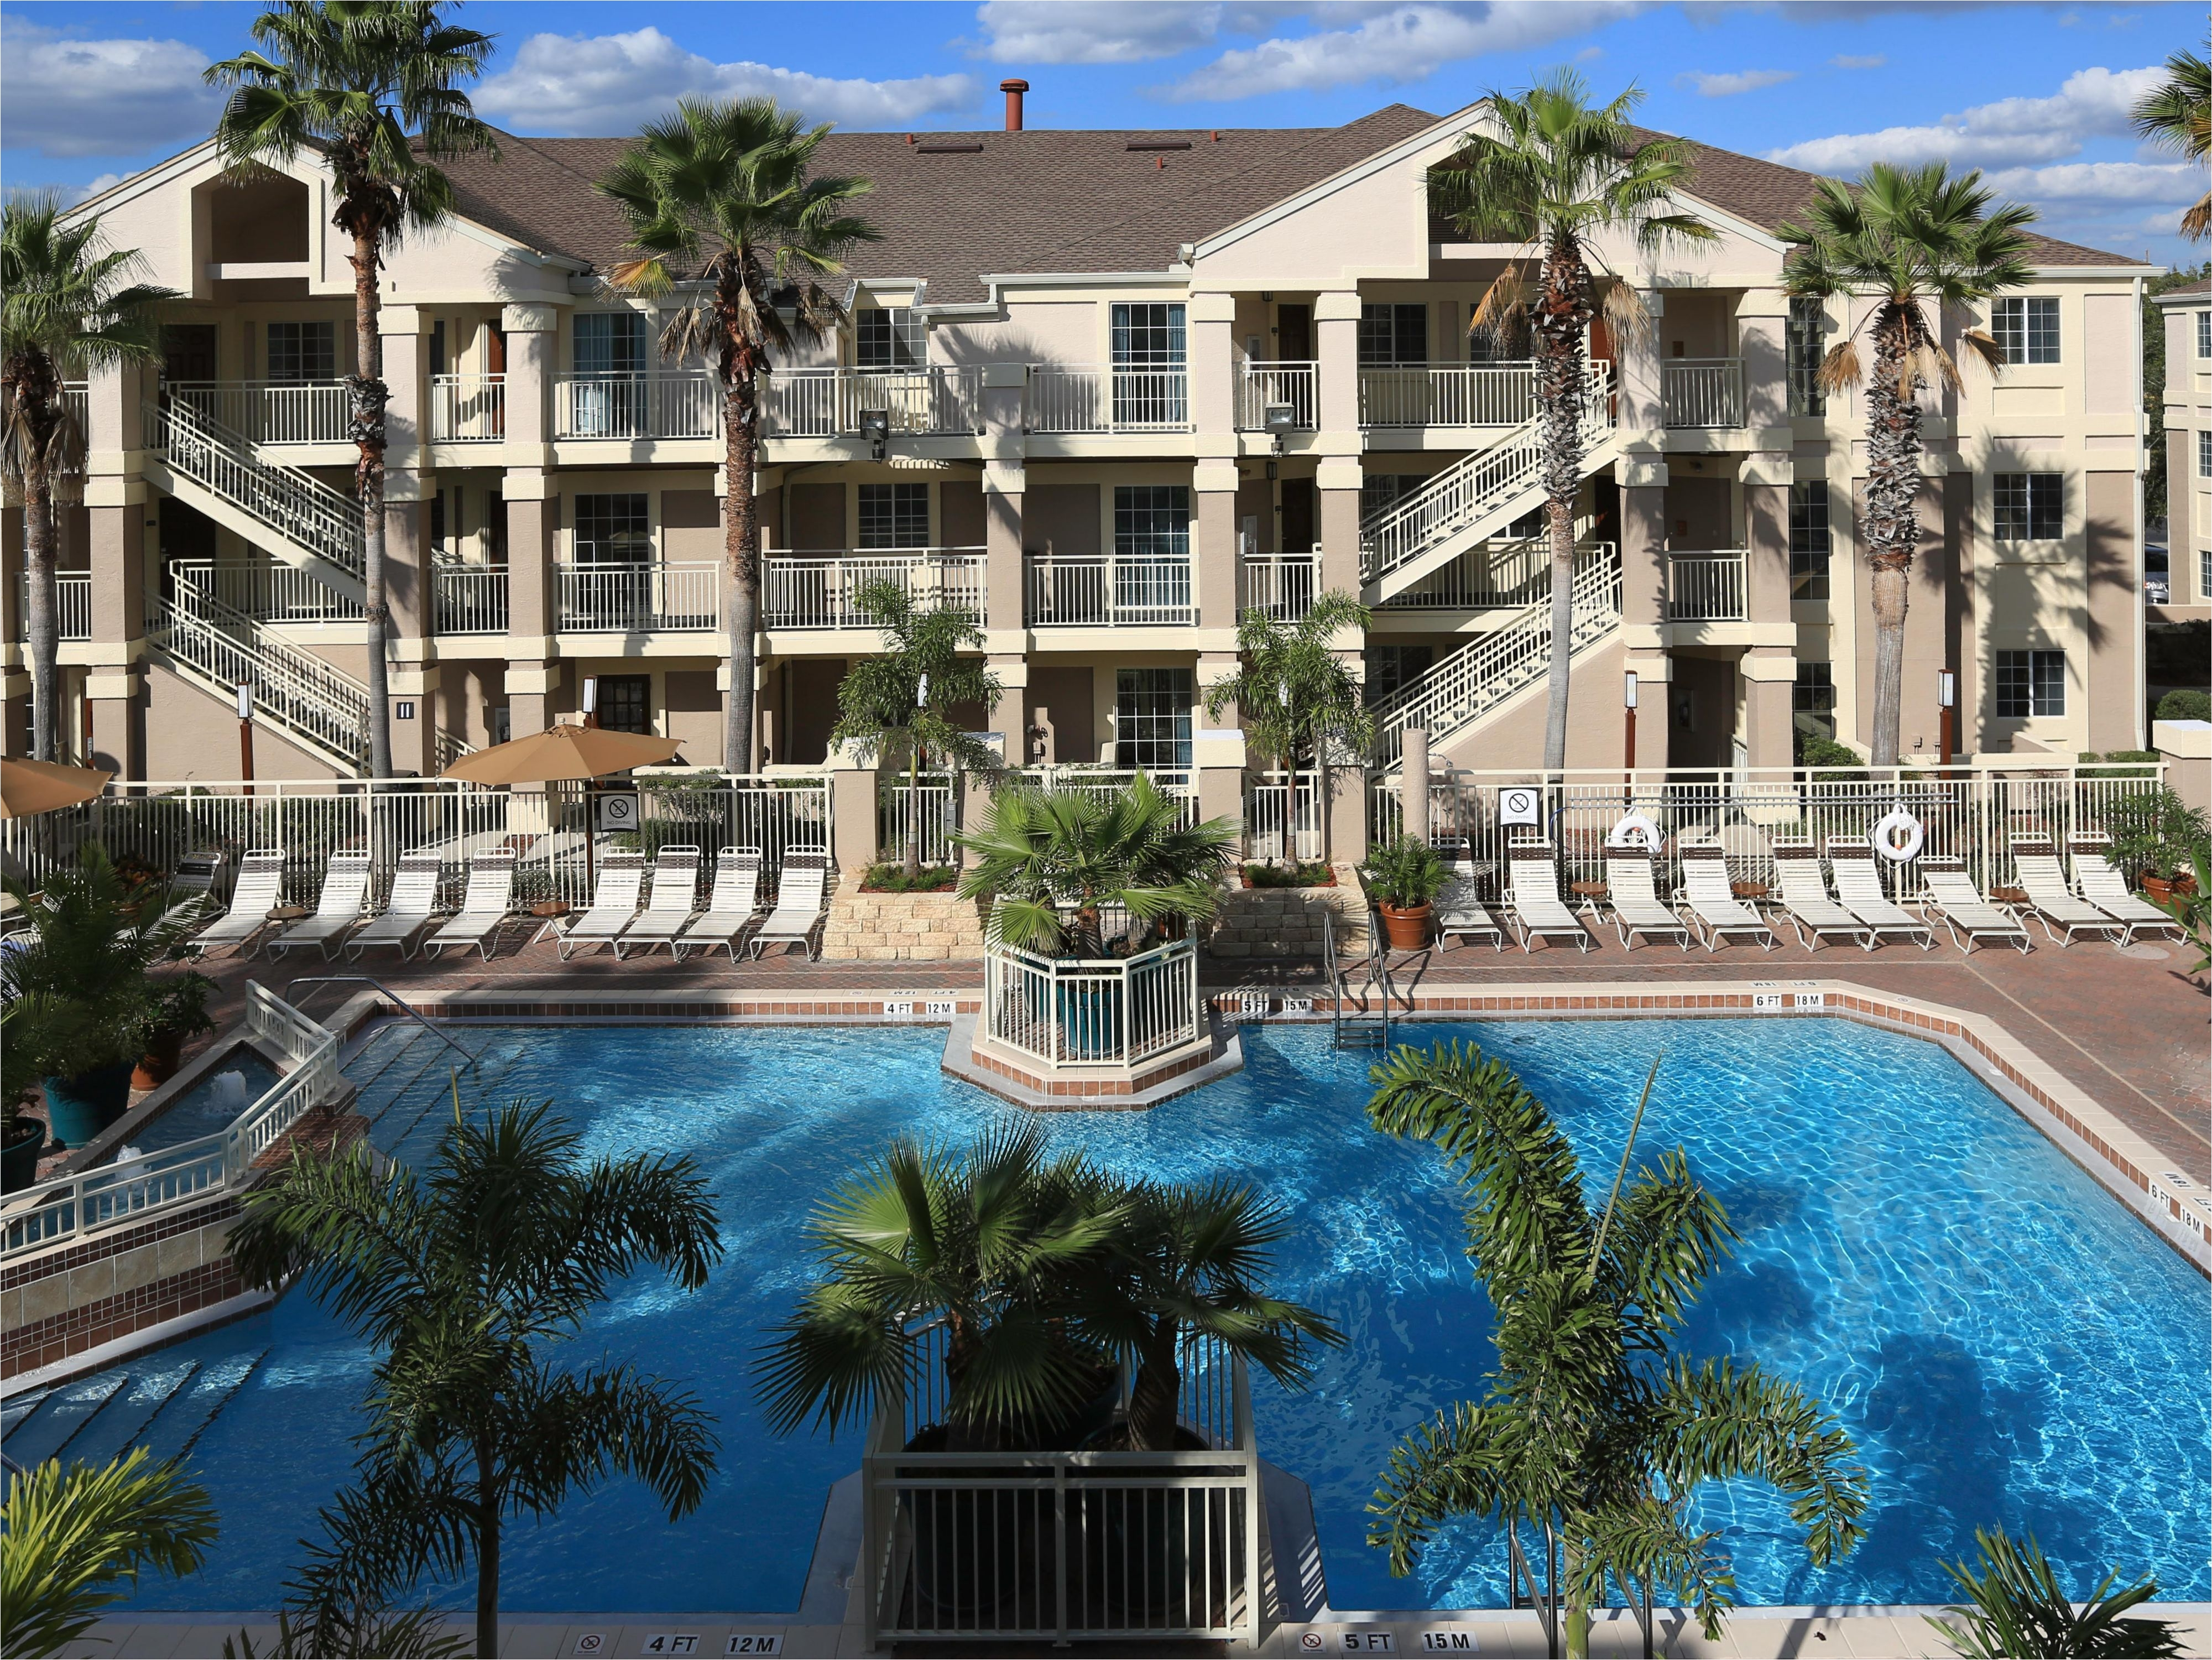 Cheap 2 Bedroom Suites Near Disney World orlando Hotels Staybridge Suites Lake Buena Vista Extended Stay